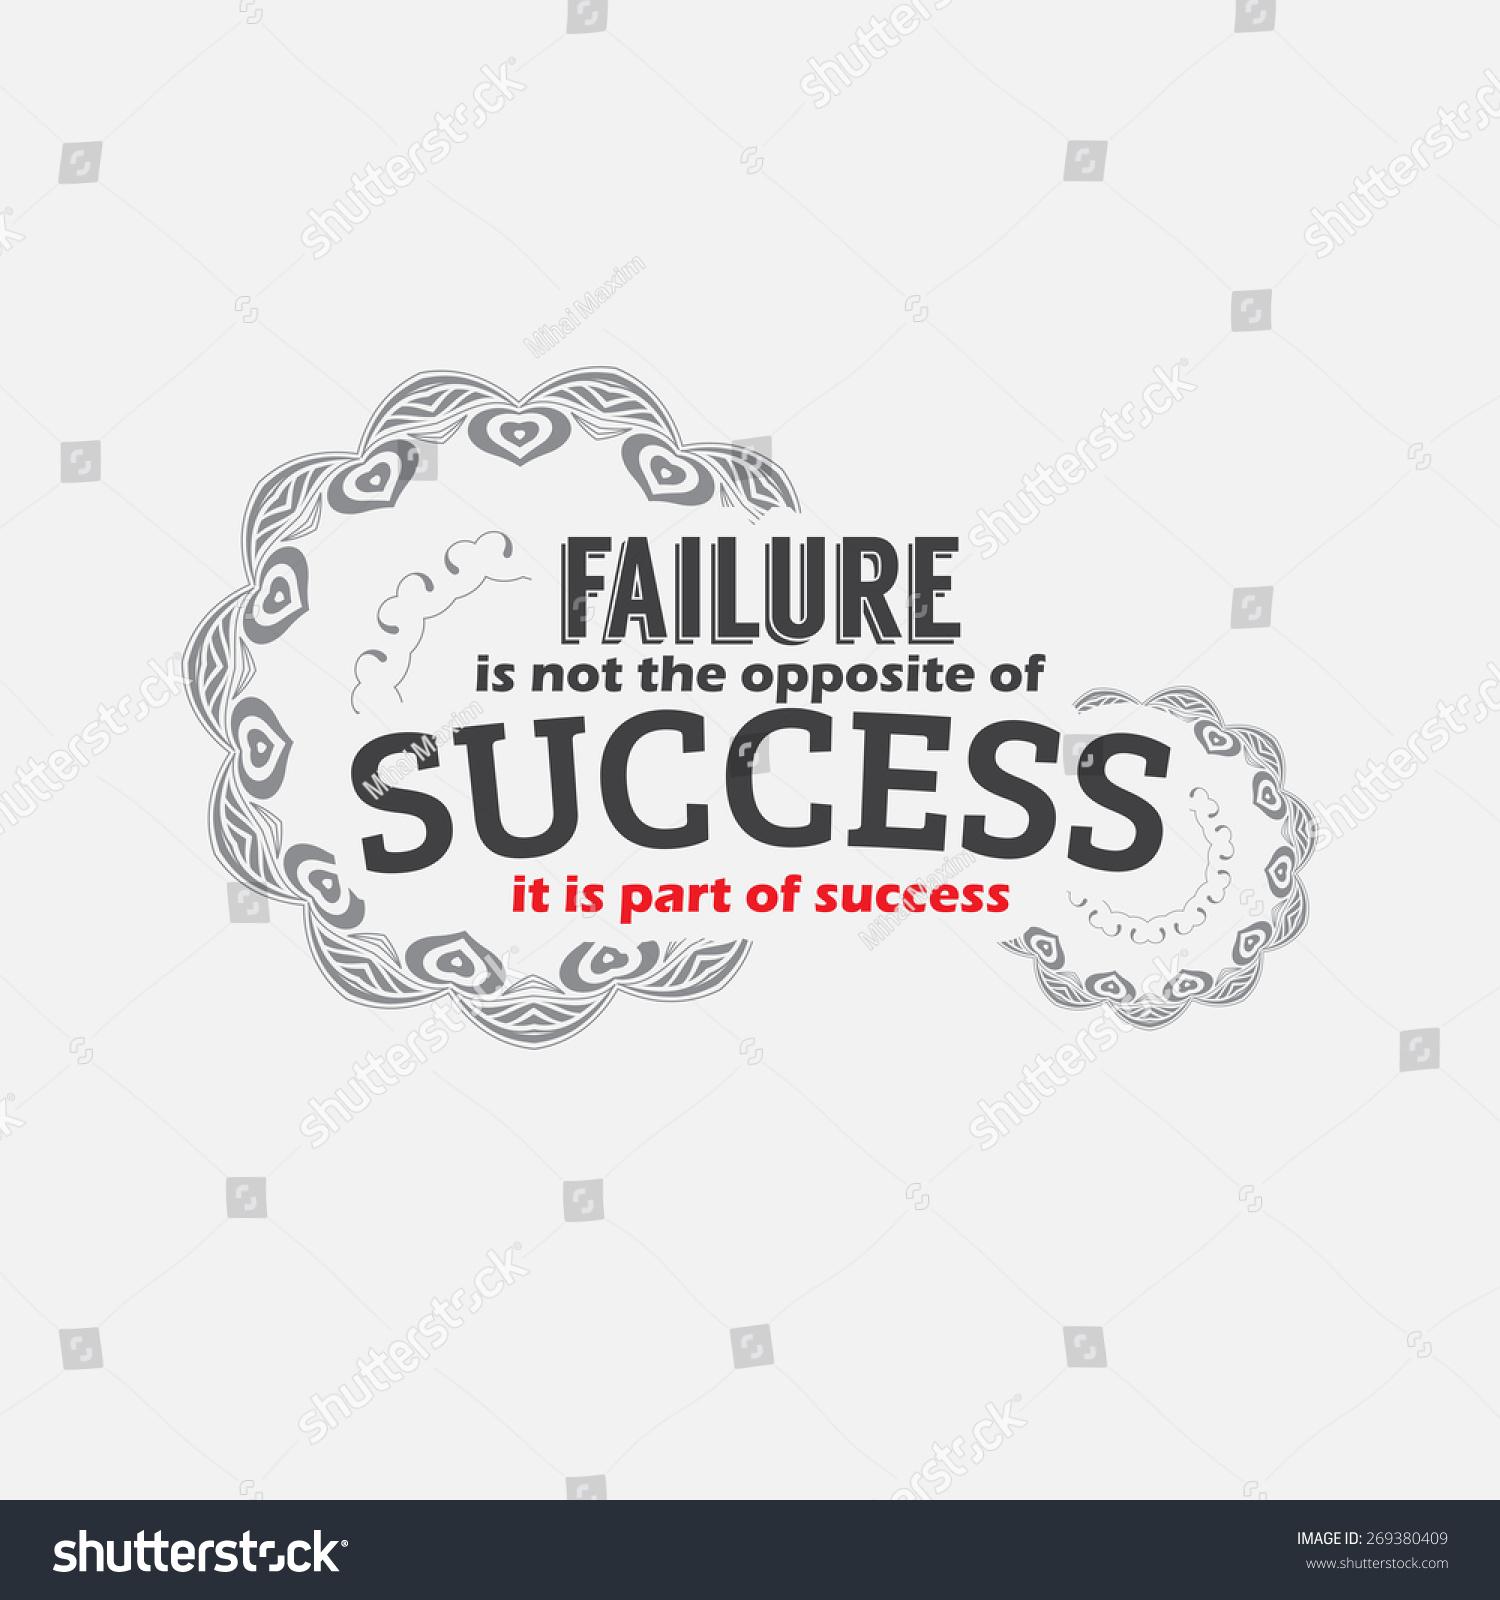 Inspirational Quotes About Failure: Failure Not Opposite Success Part Success Stock Vector